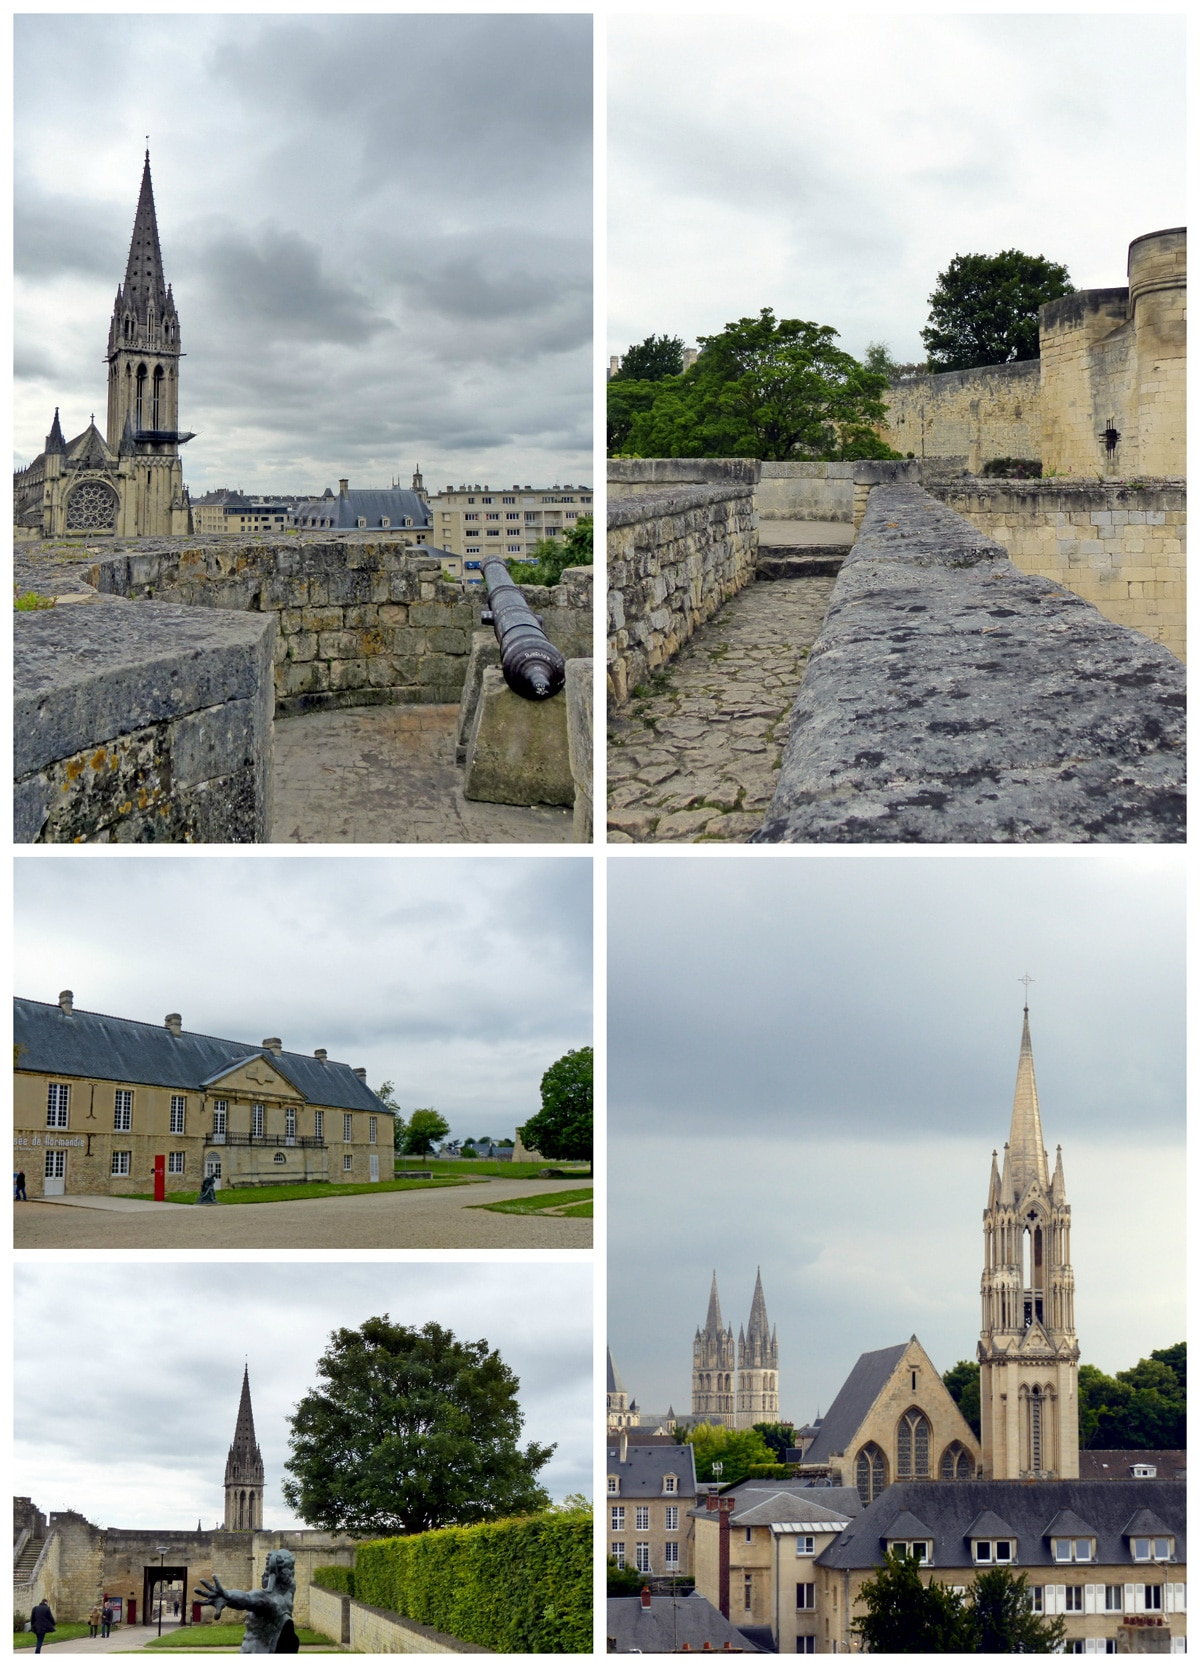 Decouvrir_Caen_Calvados_Normandie_Chateau